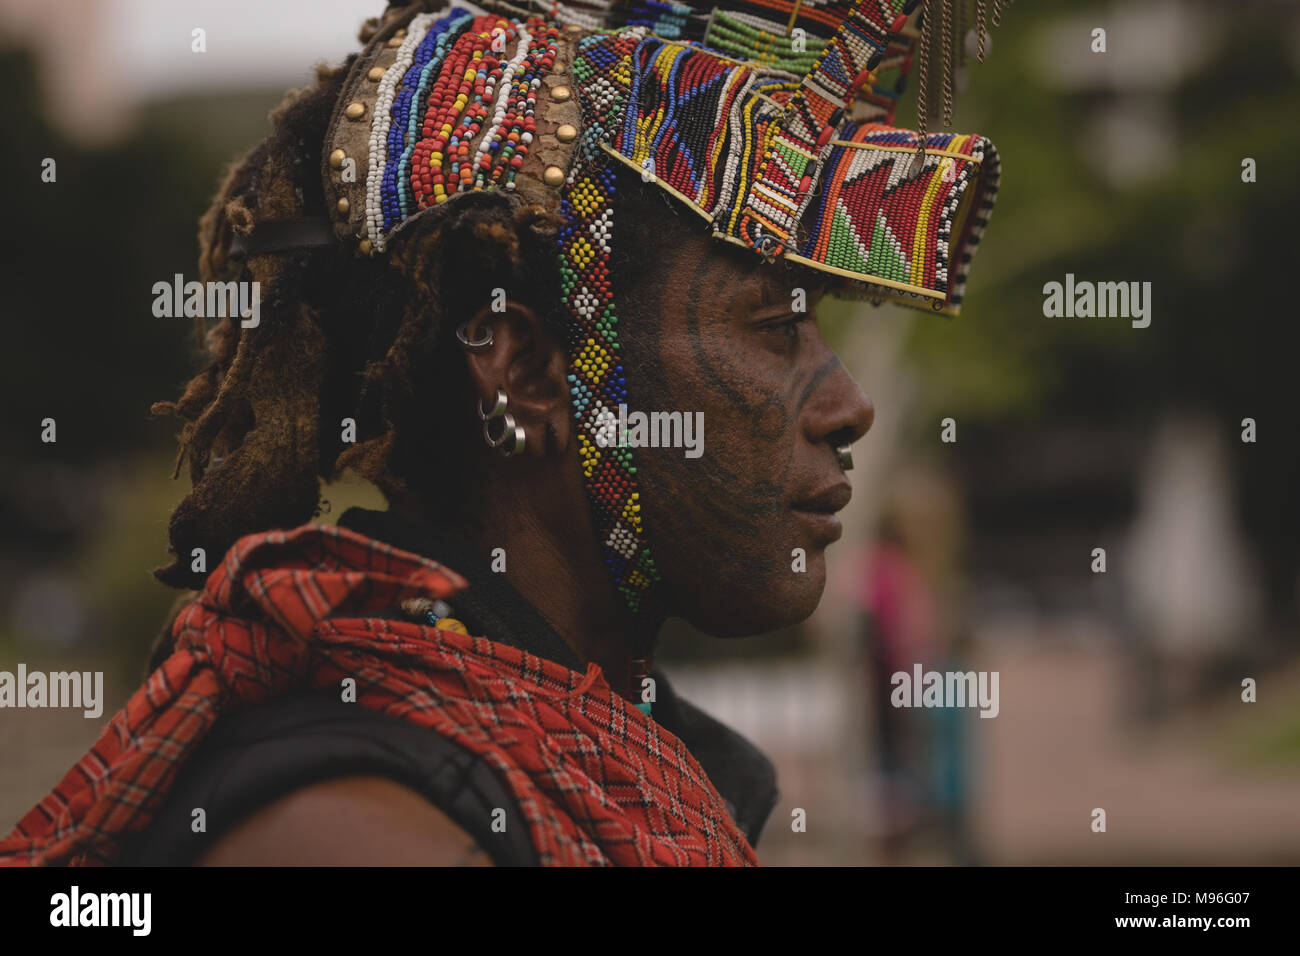 Maasai man wearing beaded headwear - Stock Image